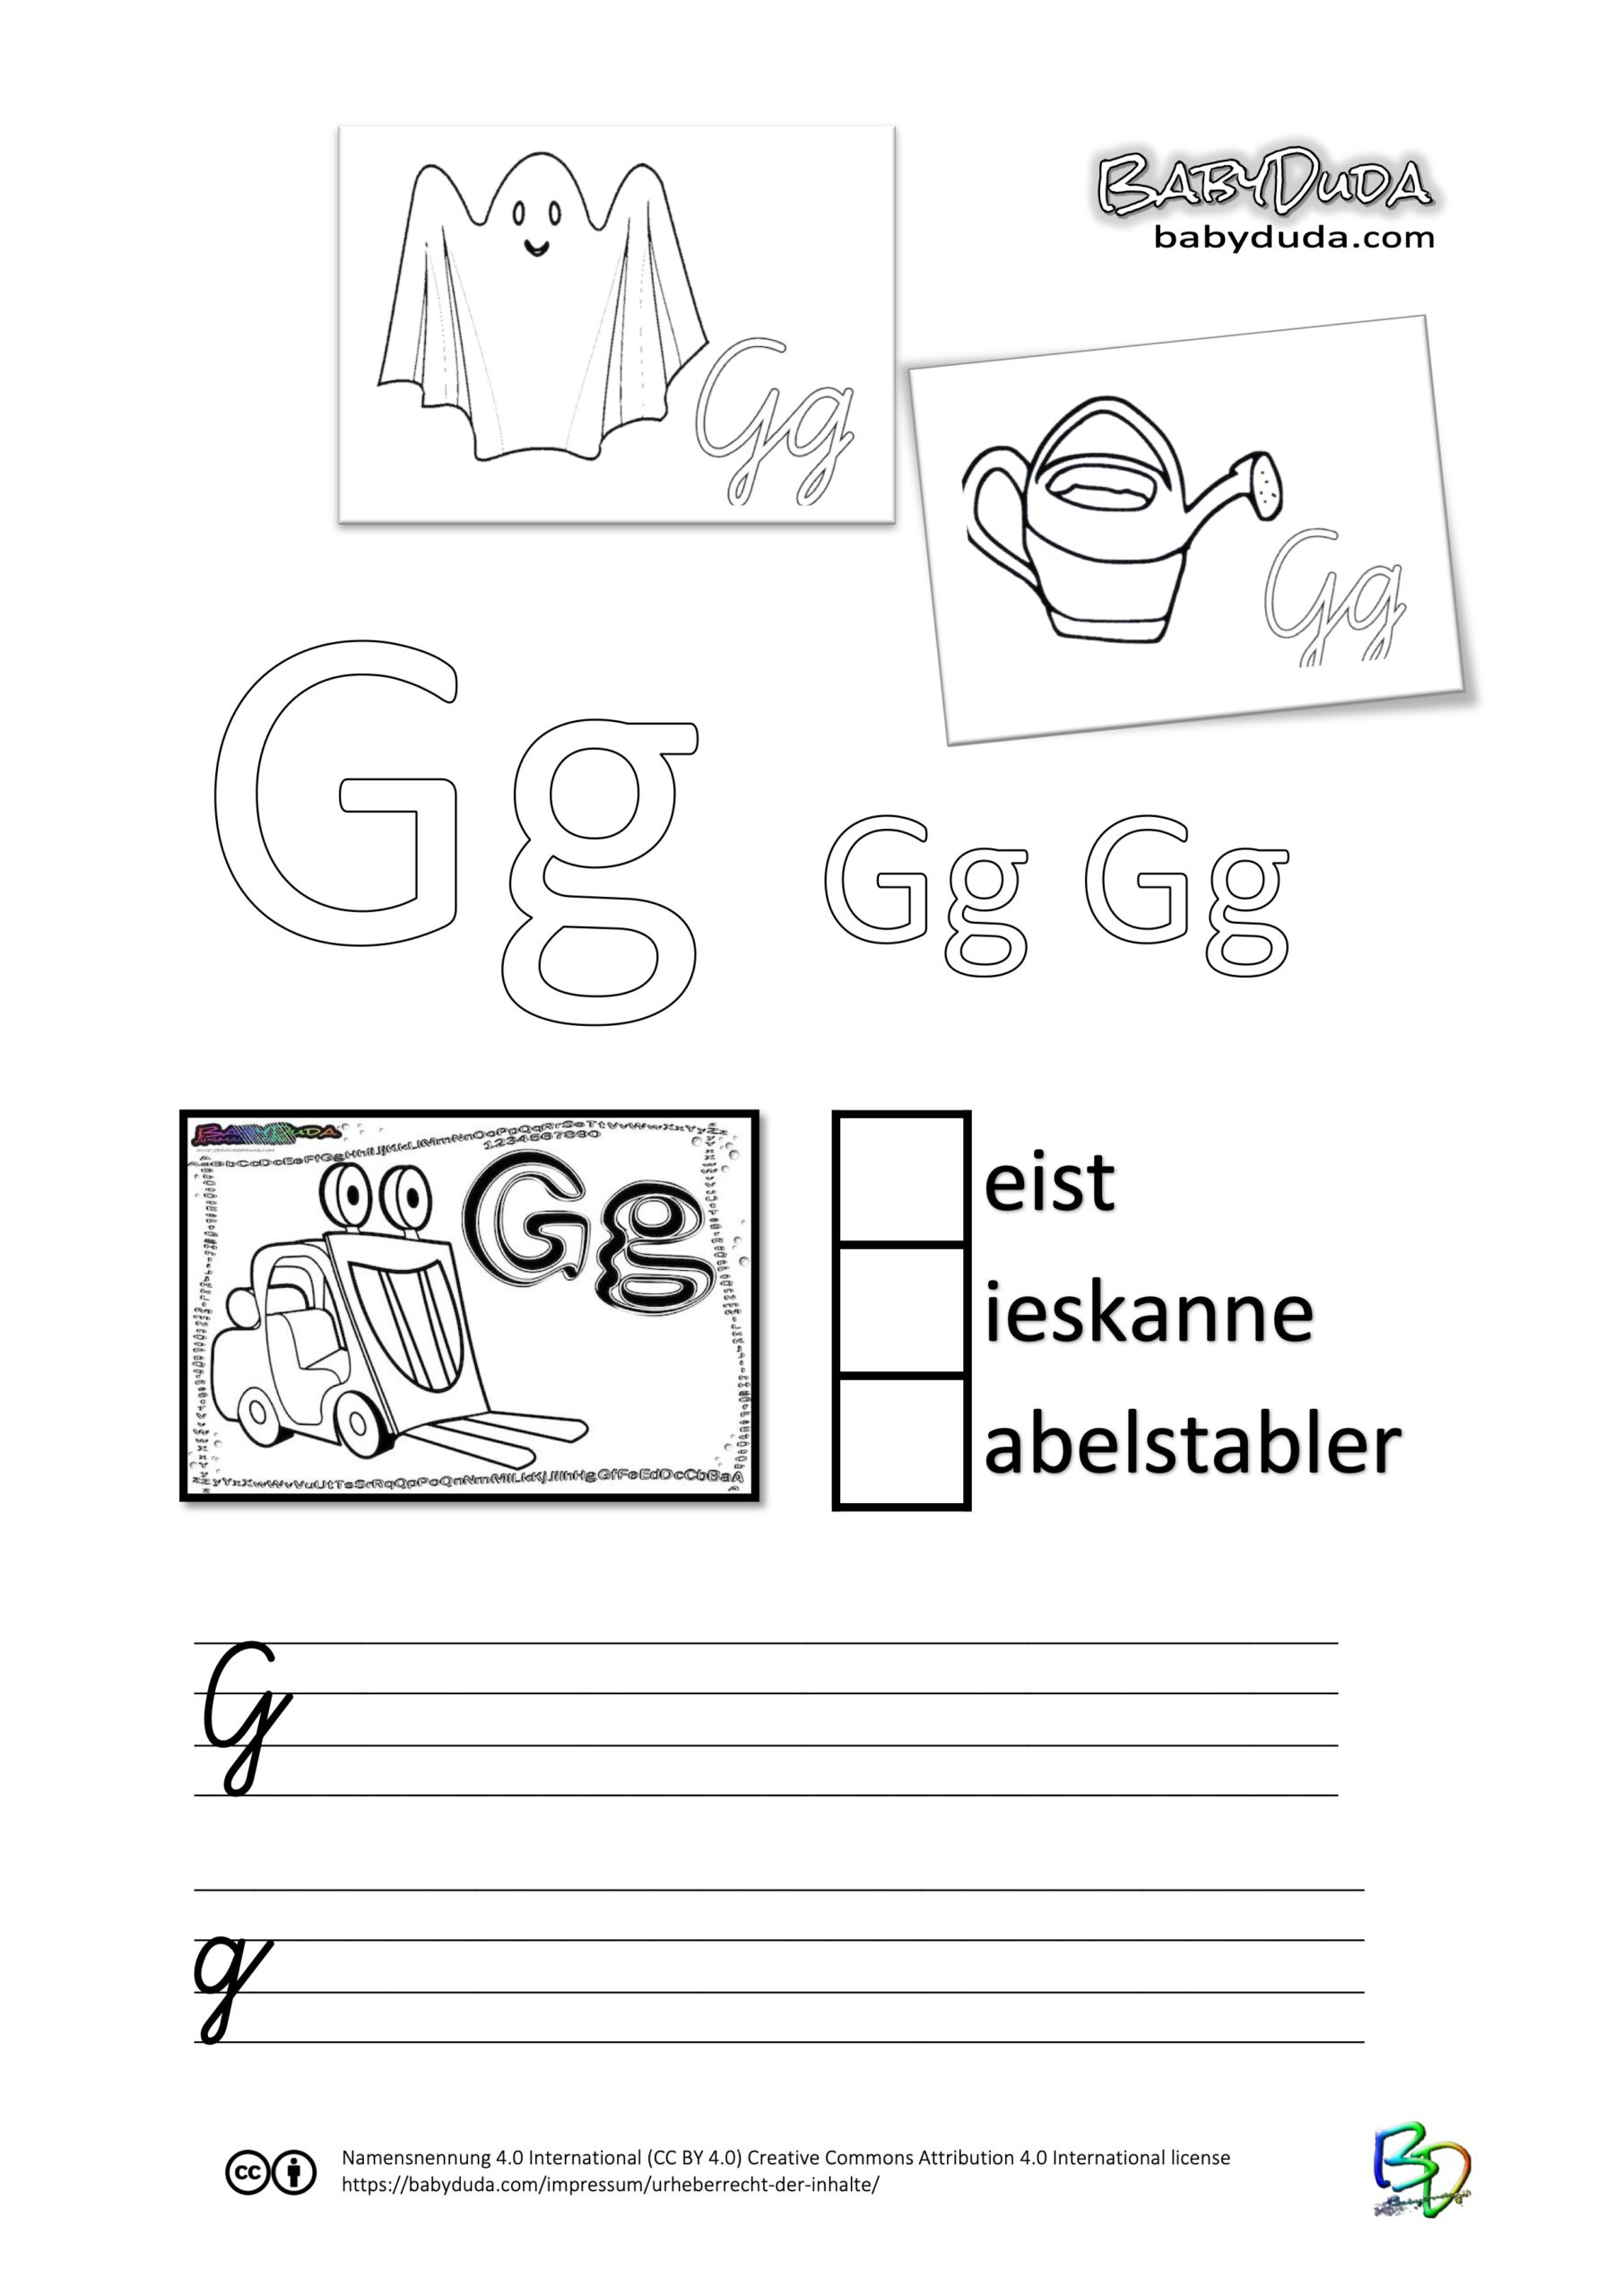 ABC-Ausmalbuch-Arbeitsblatt-G